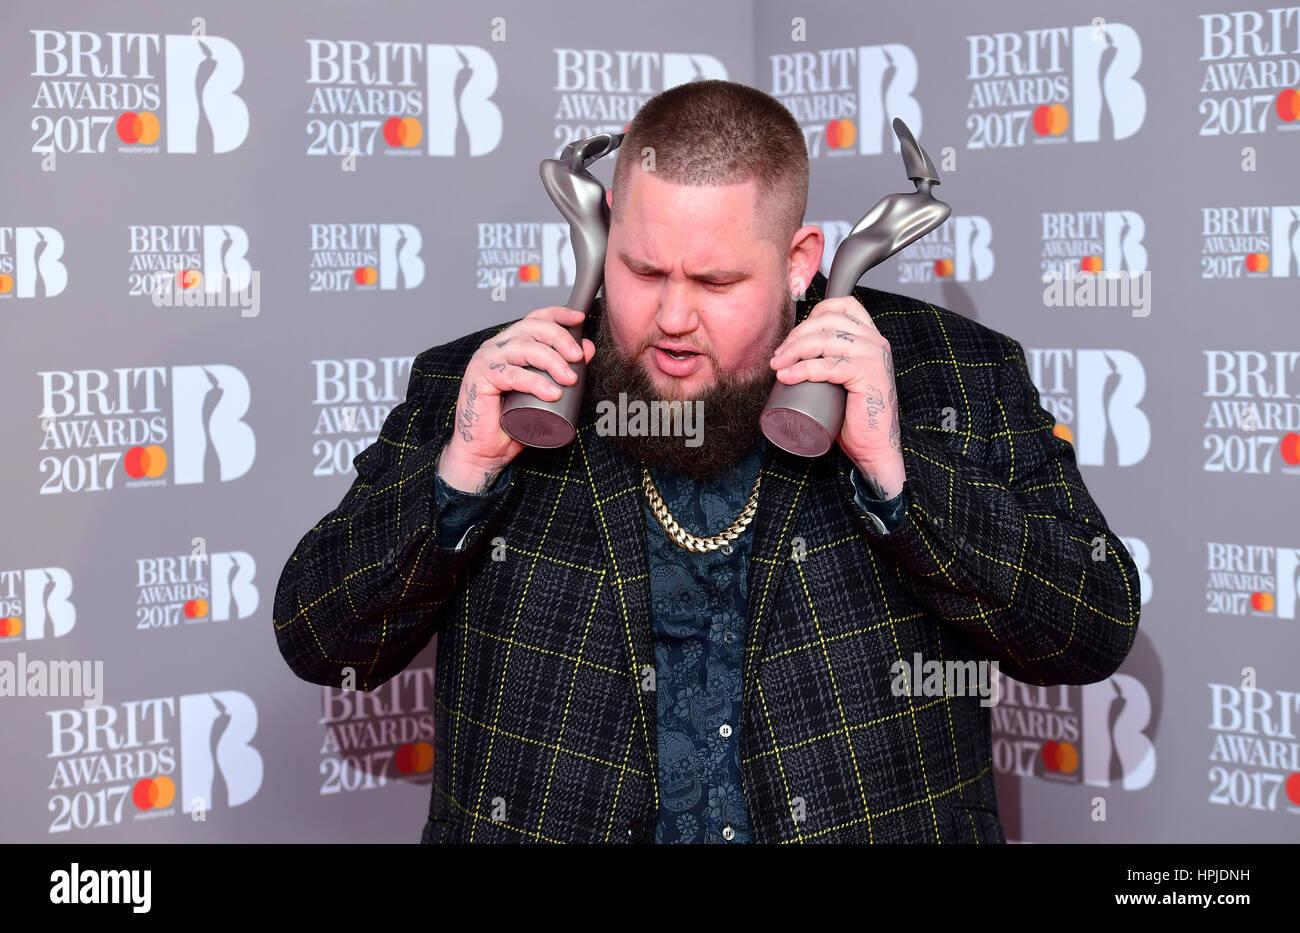 Rag 'n' Bone Man aka Rory Graham with the Critic's Choice and Best British Breakthrough Artist Award's - Stock Image